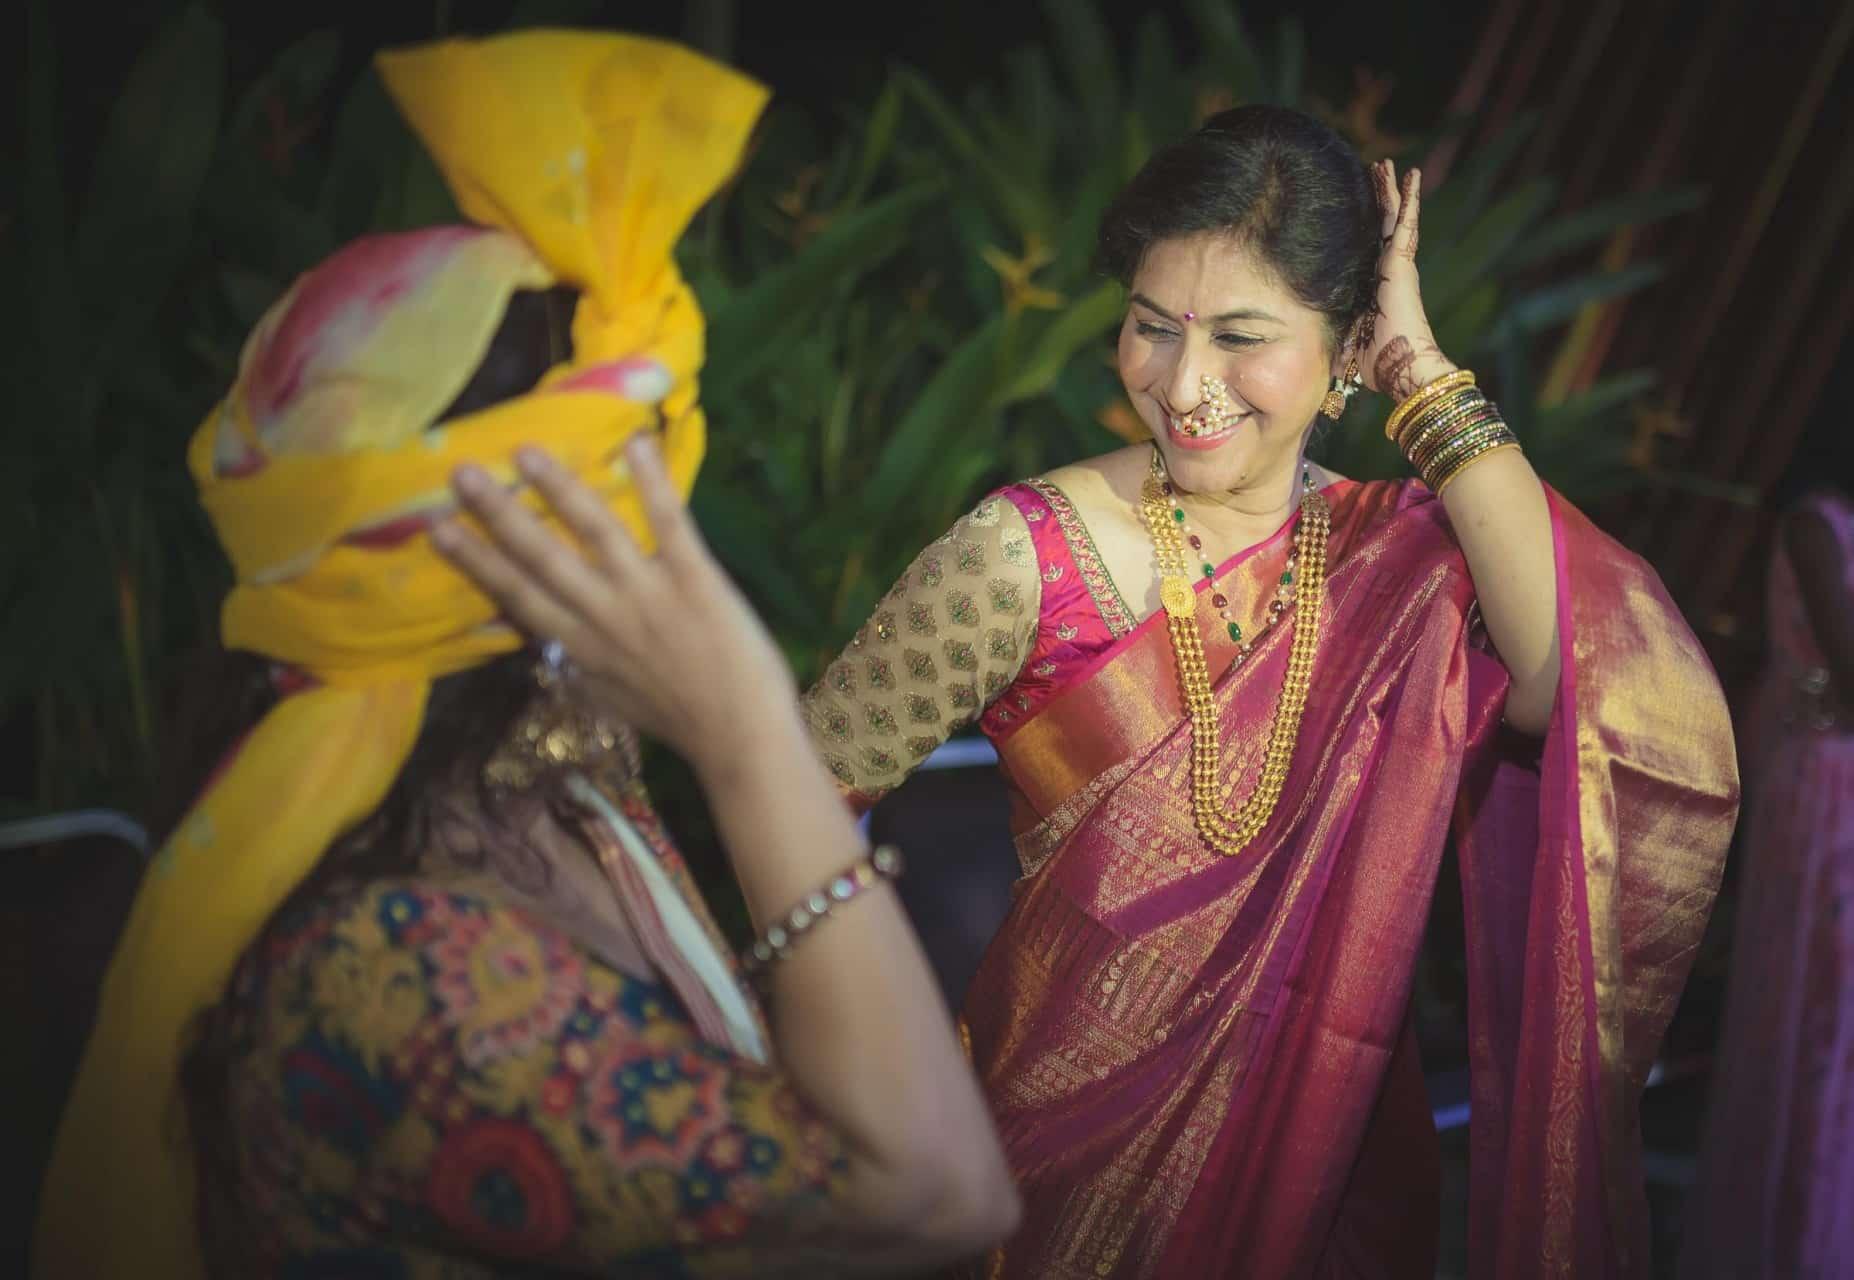 Thailand based Wedding Photographer | Baraat Concert Photography Bangkok